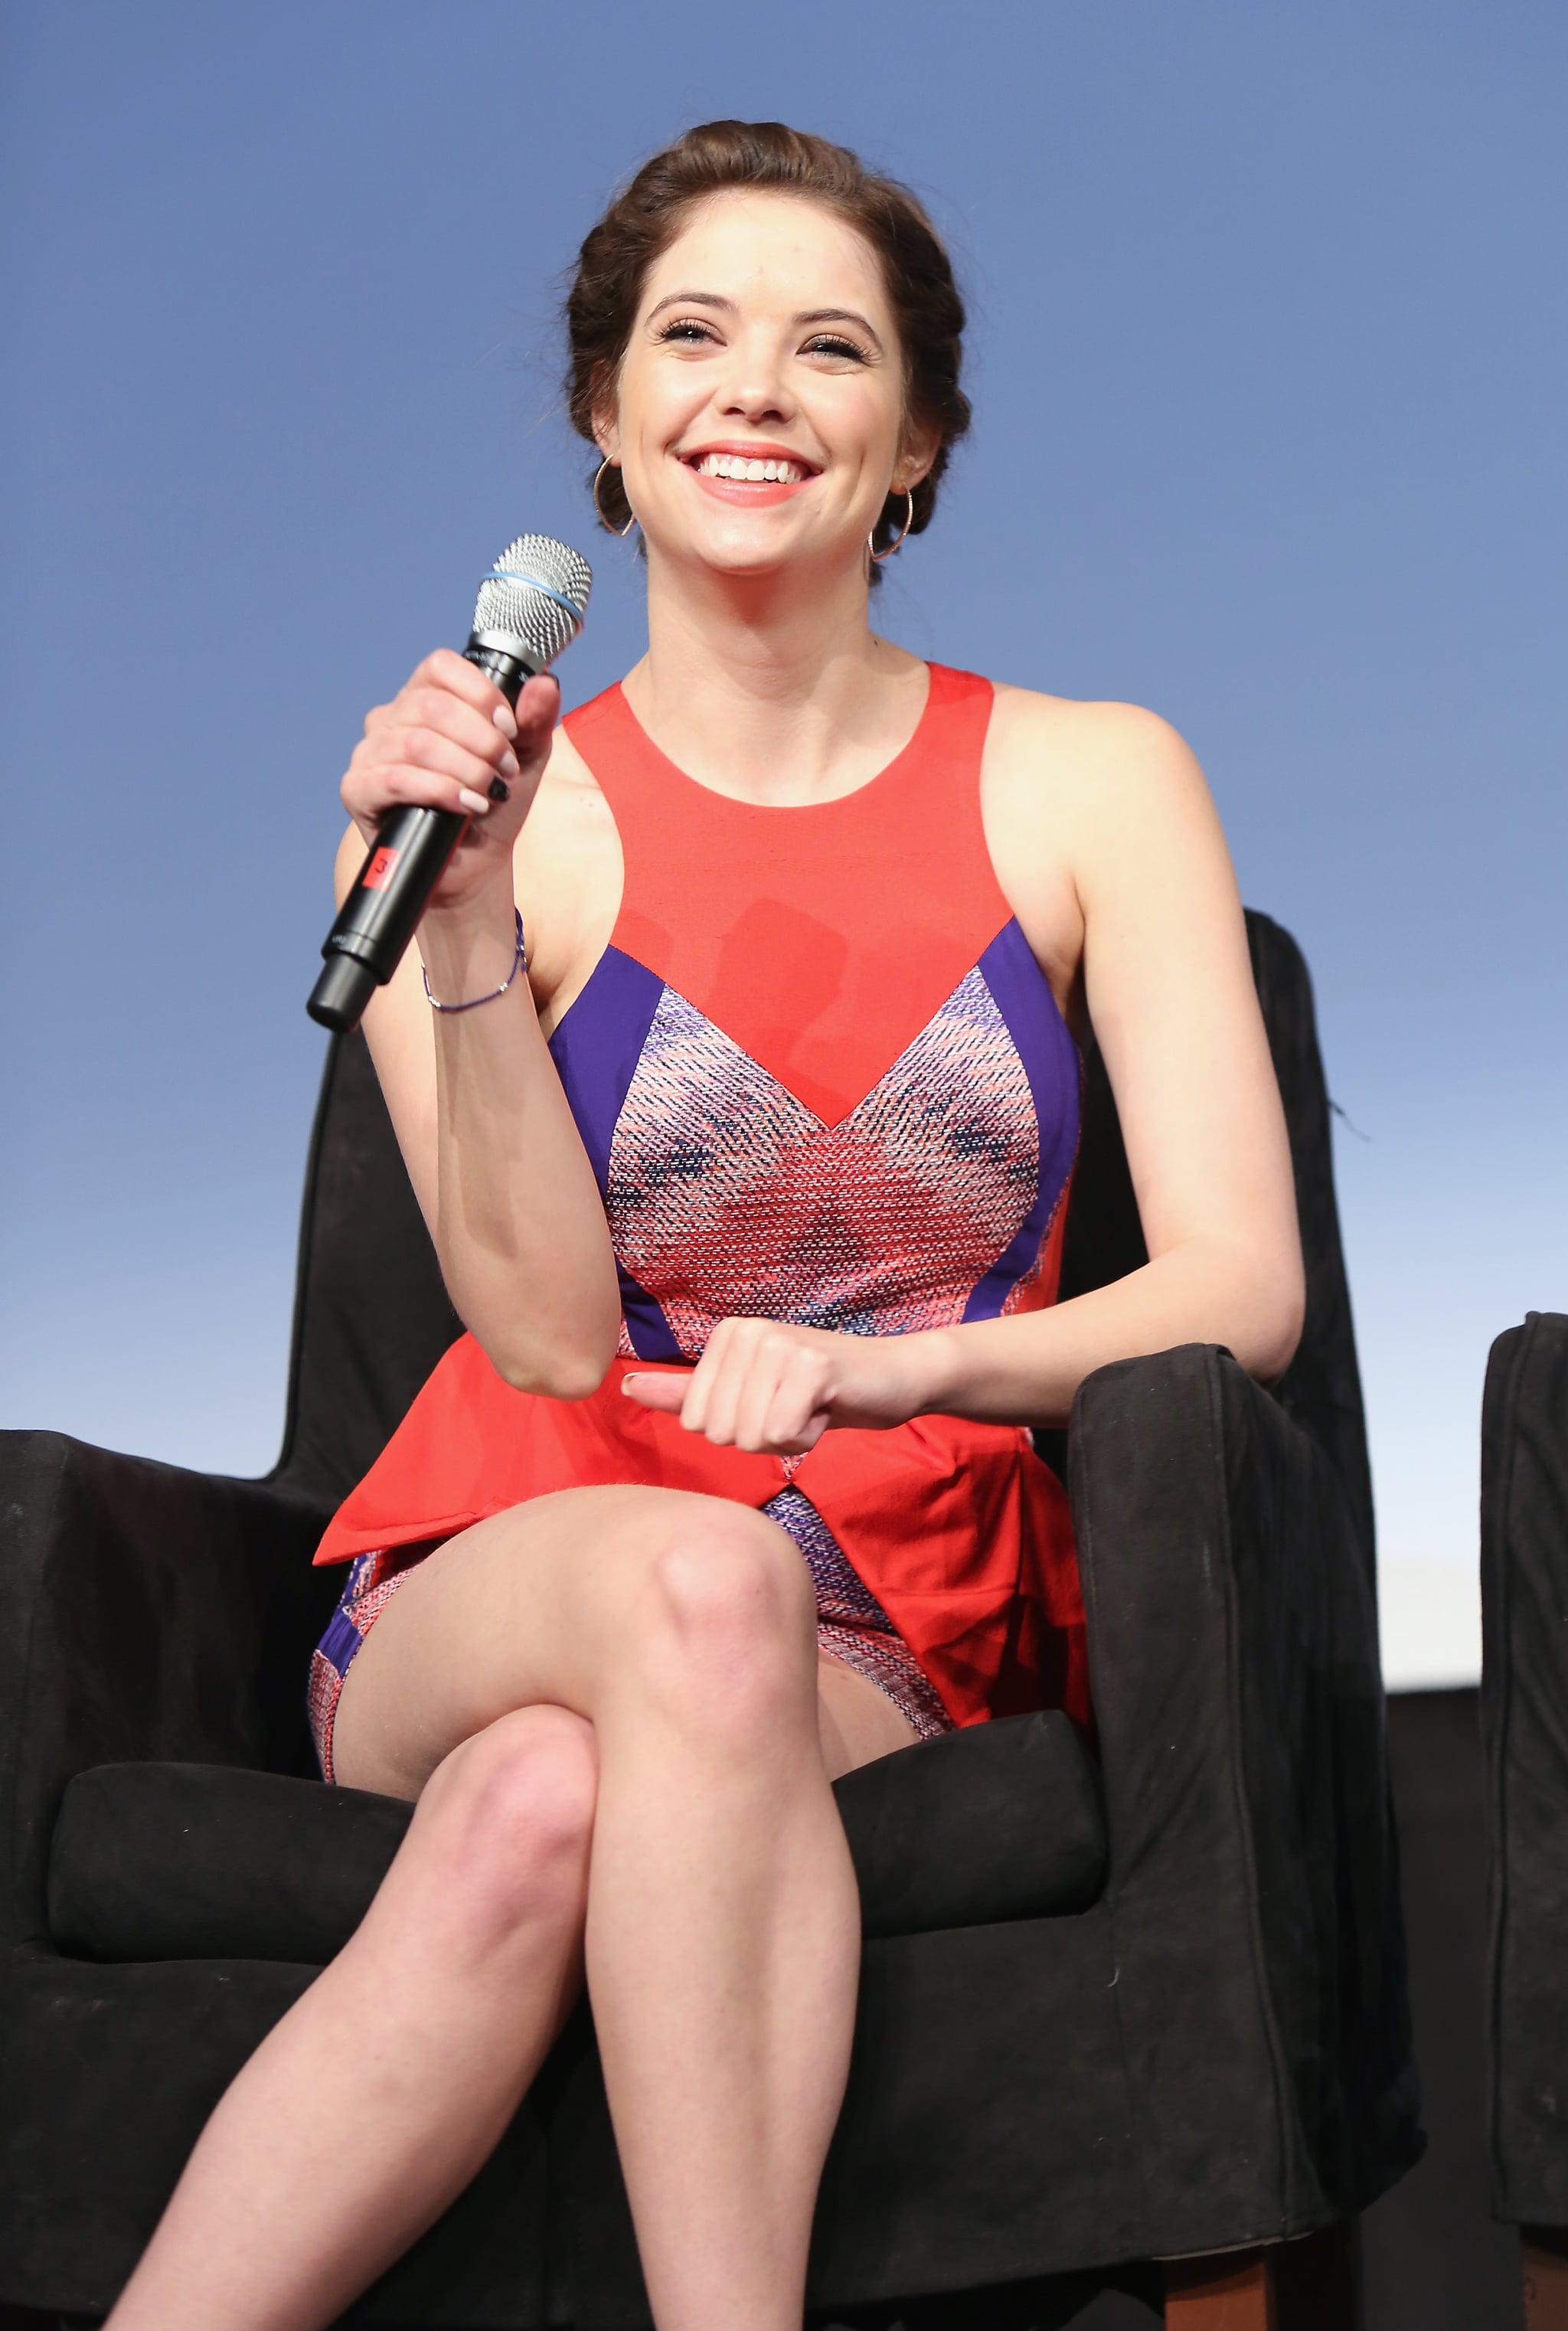 Ashley Benson giggled during the panel.